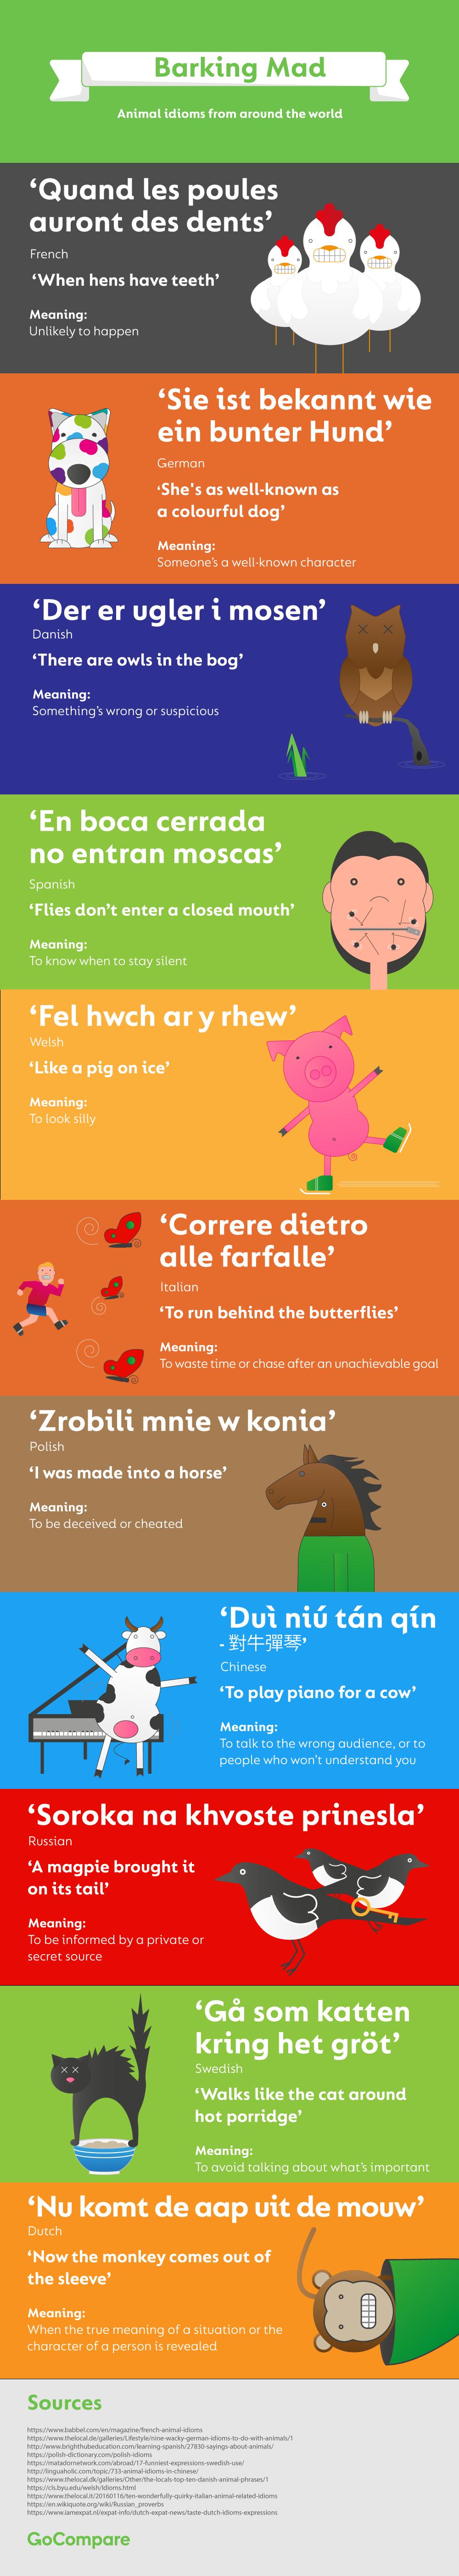 infographic animal idioms